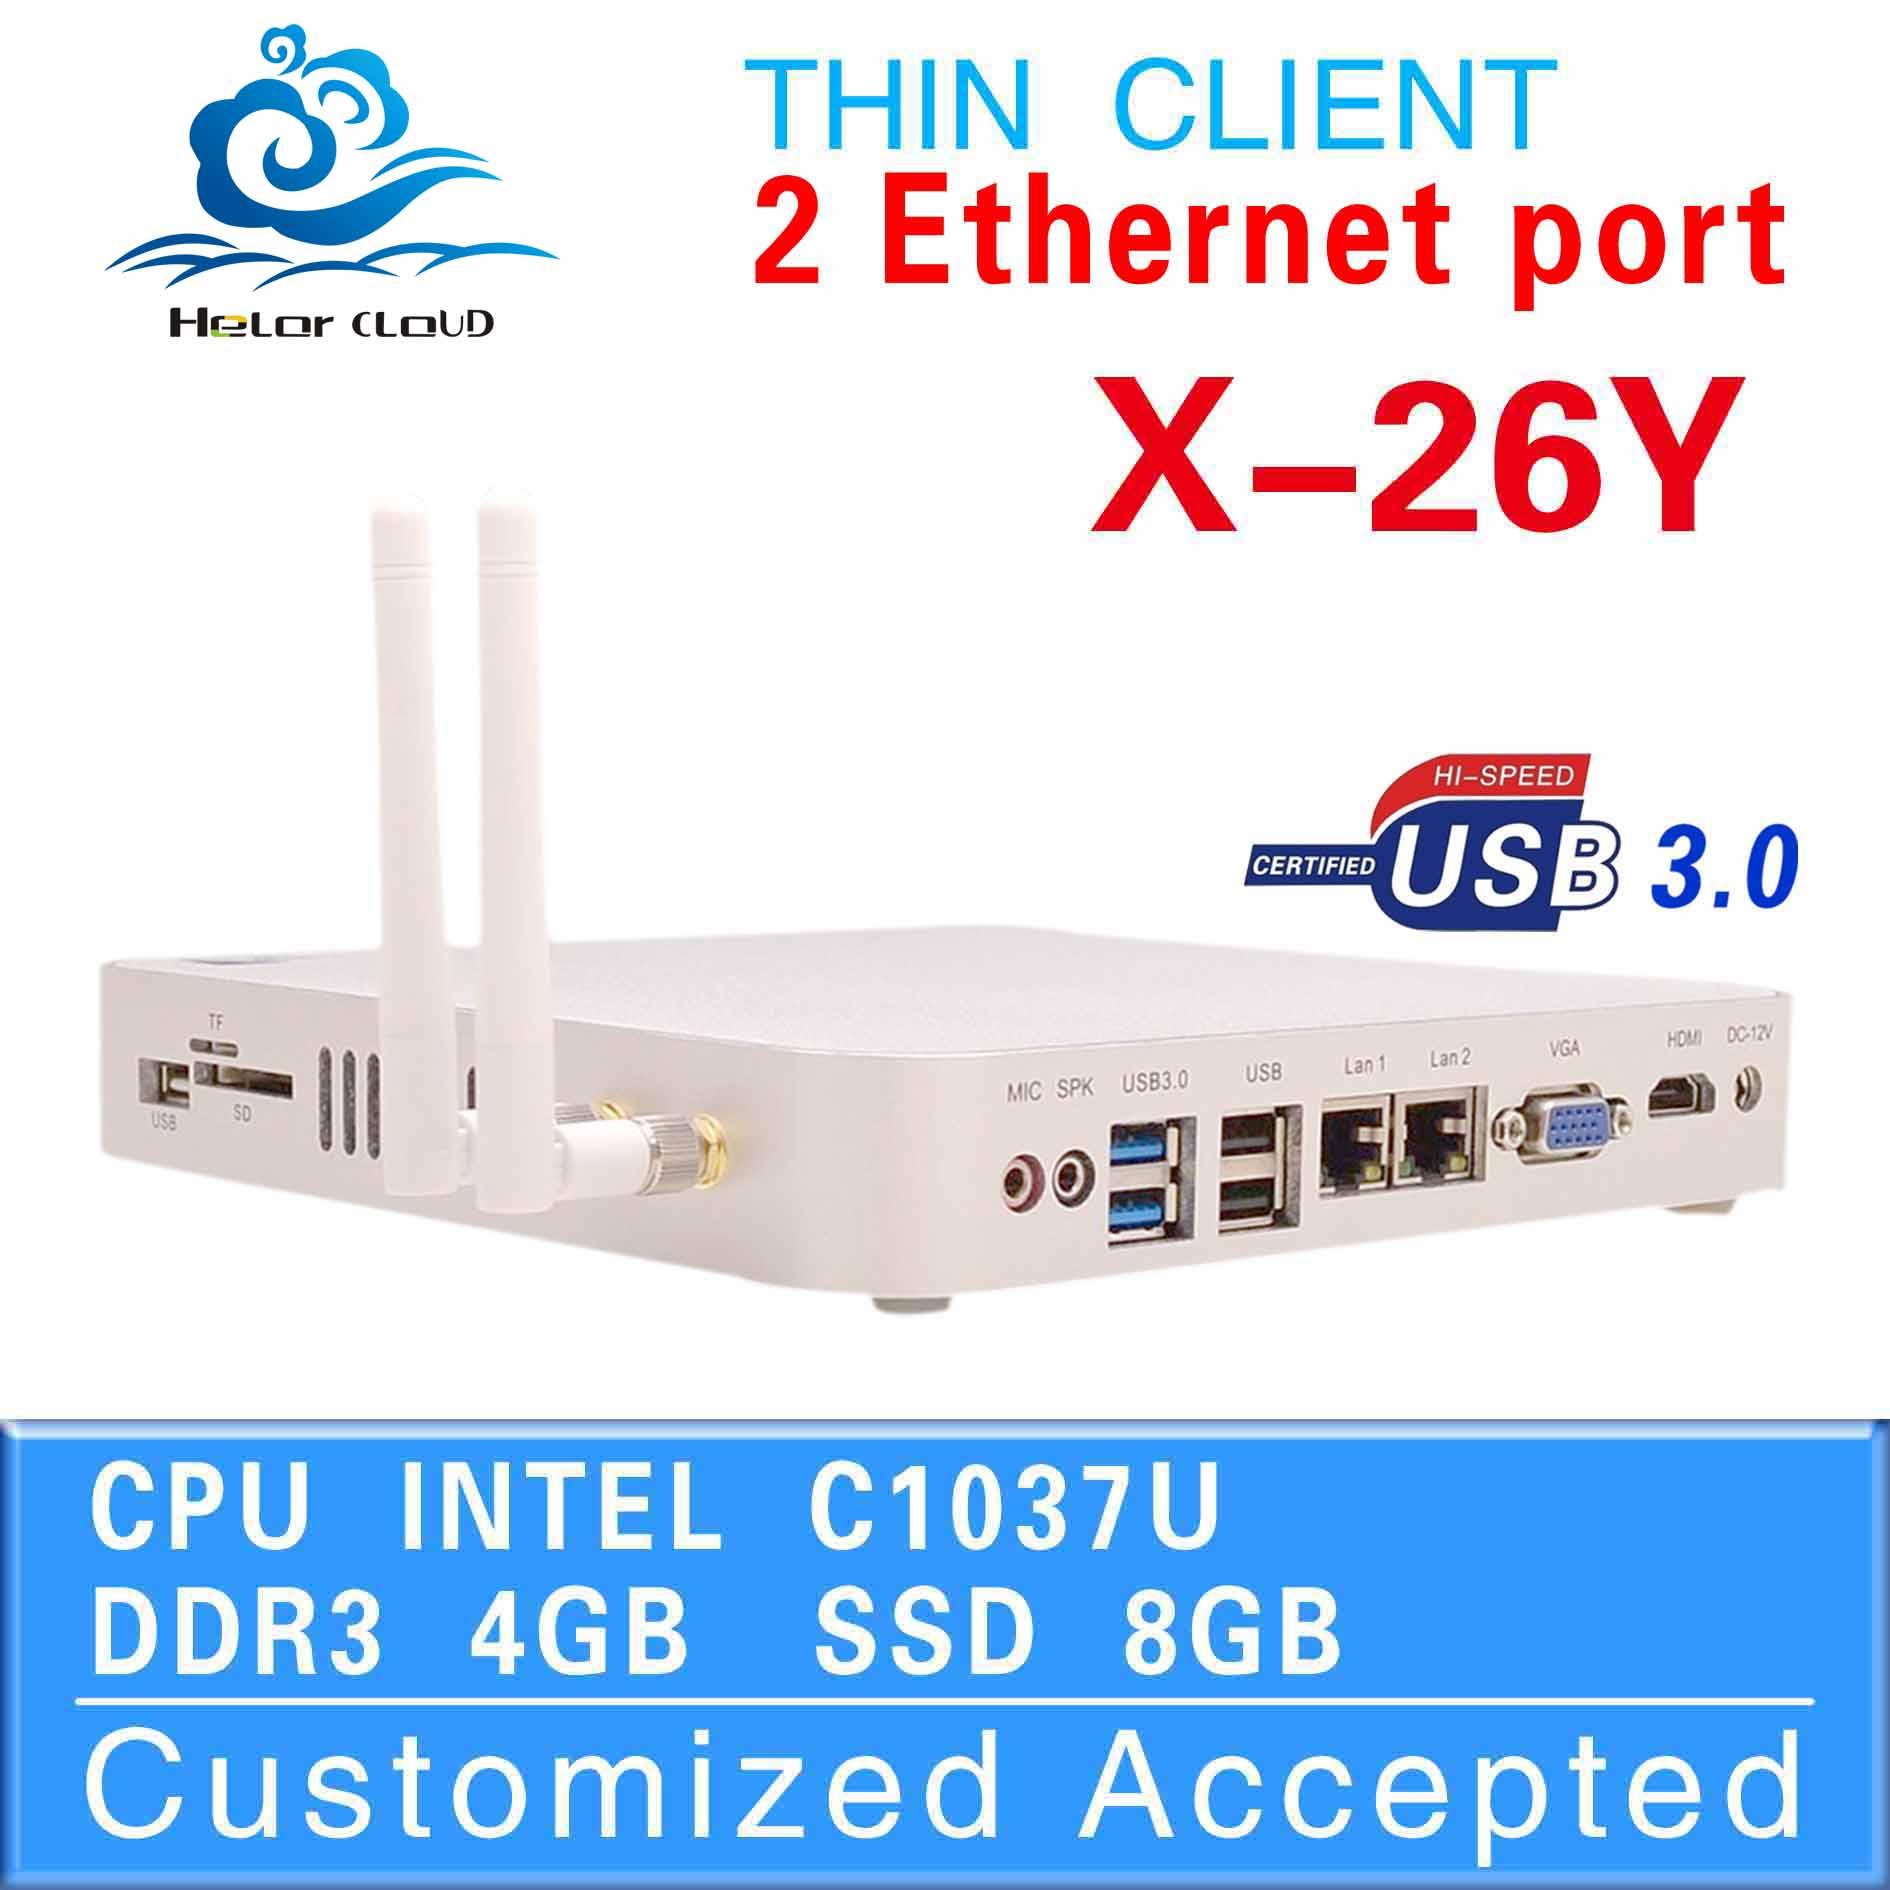 itx mini pc mini server pc games for windows dual lan port C1037U 1.8GHZ 4G RAM 8G SSD 4*USB Video Resolution:1920*1080(China (Mainland))